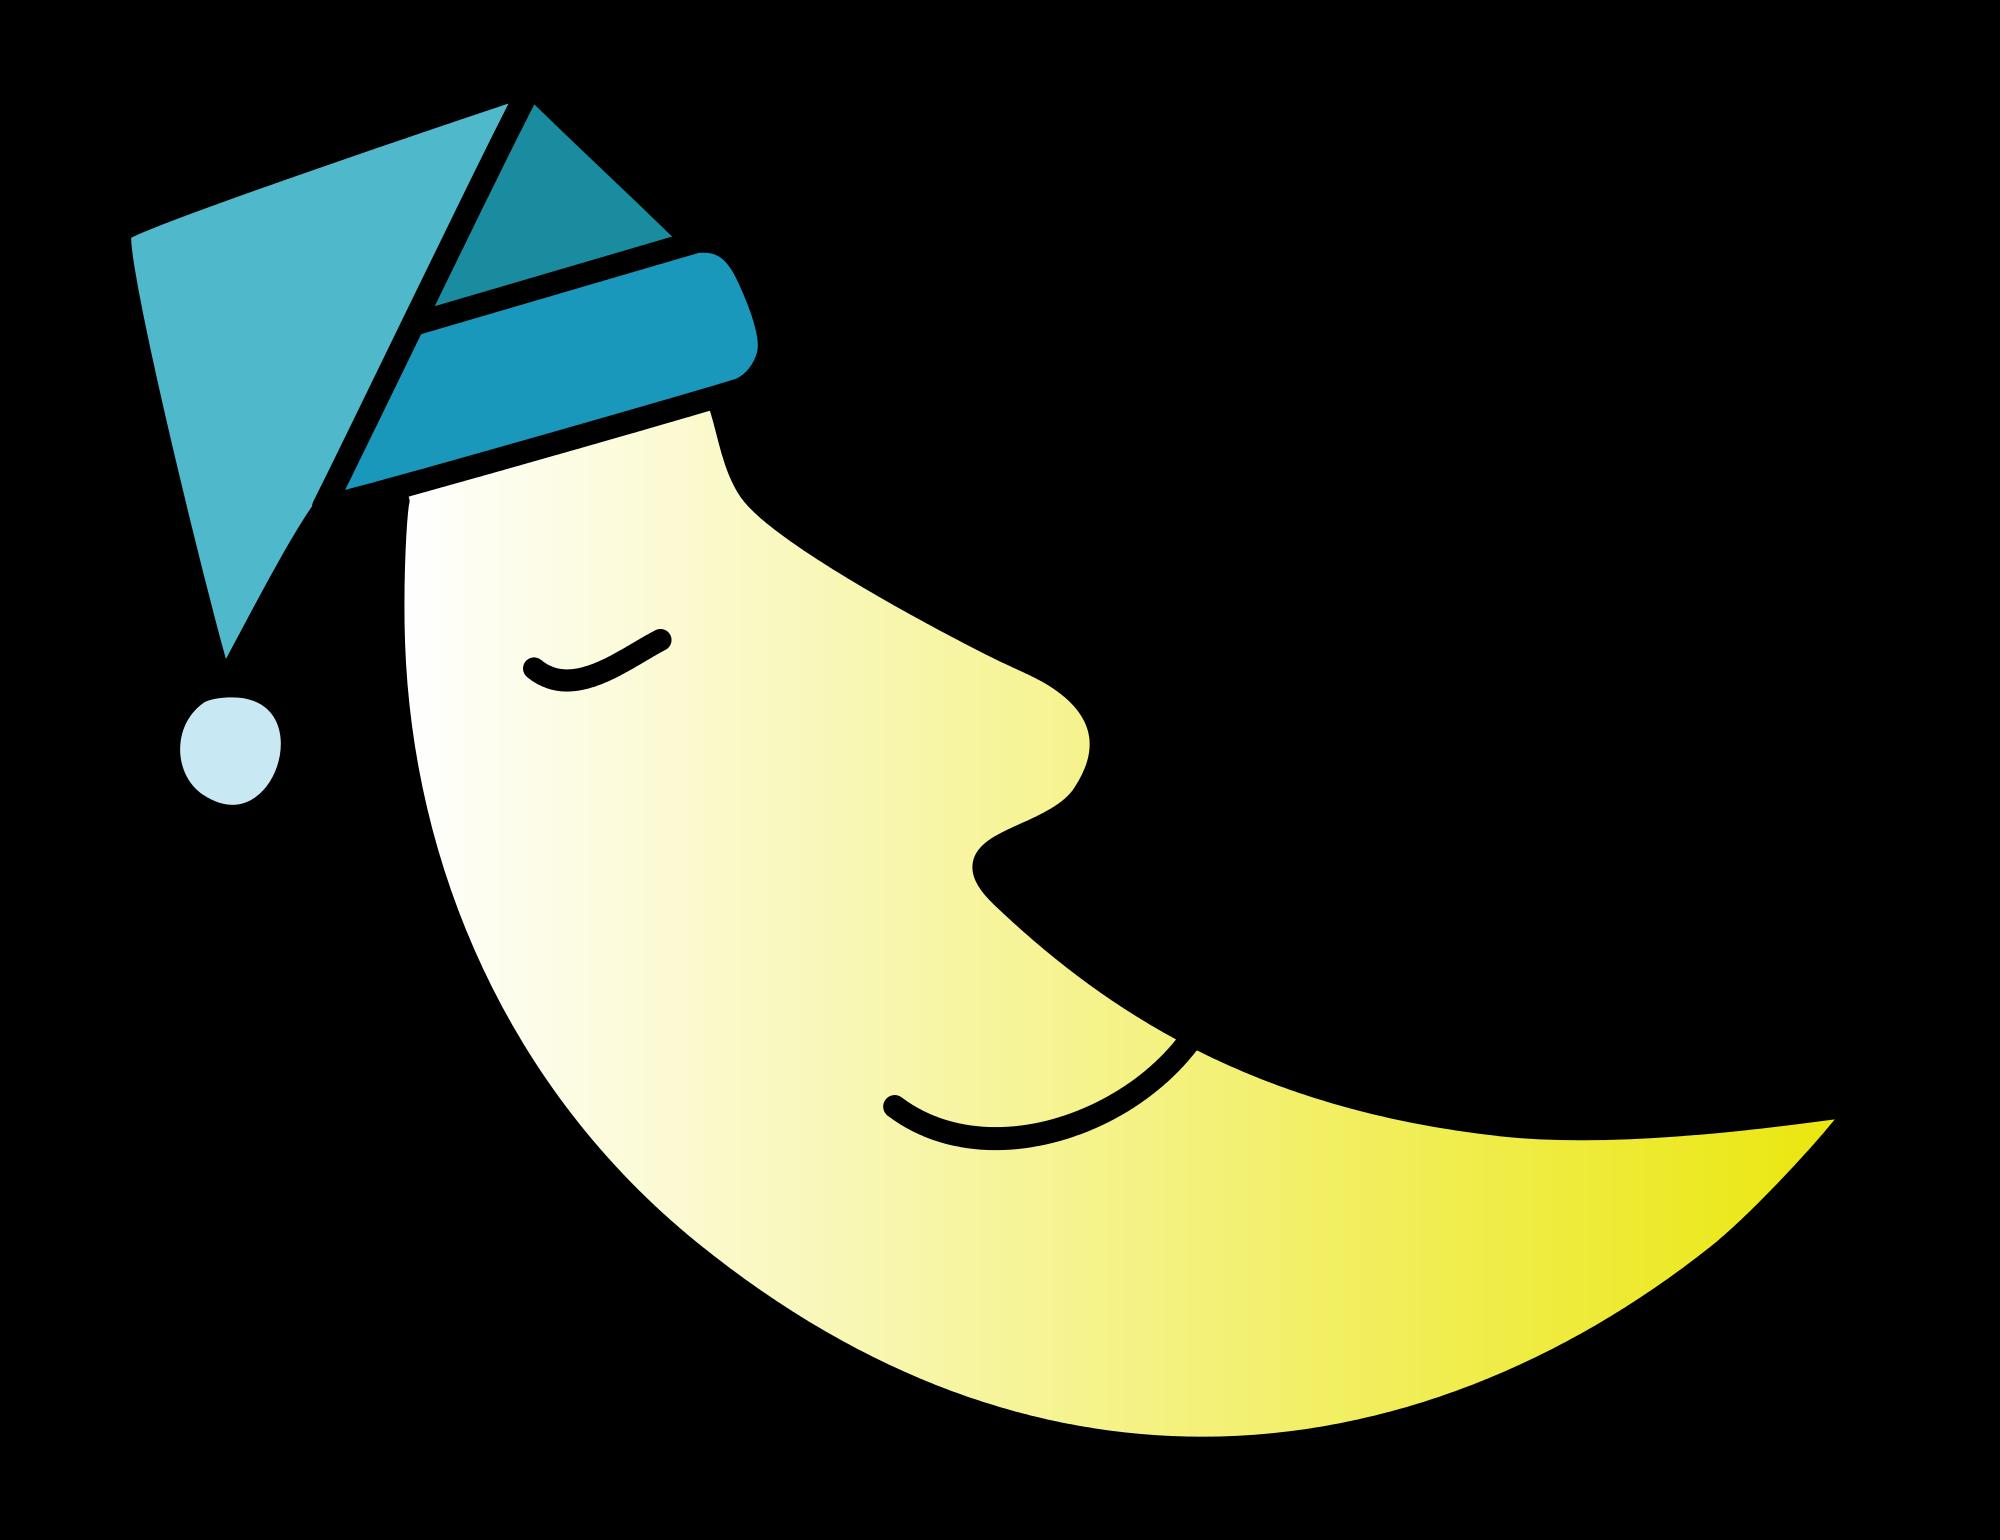 sleep clipart clipart panda free clipart images rh clipartpanda com sleepy clip art images sleep clip art images